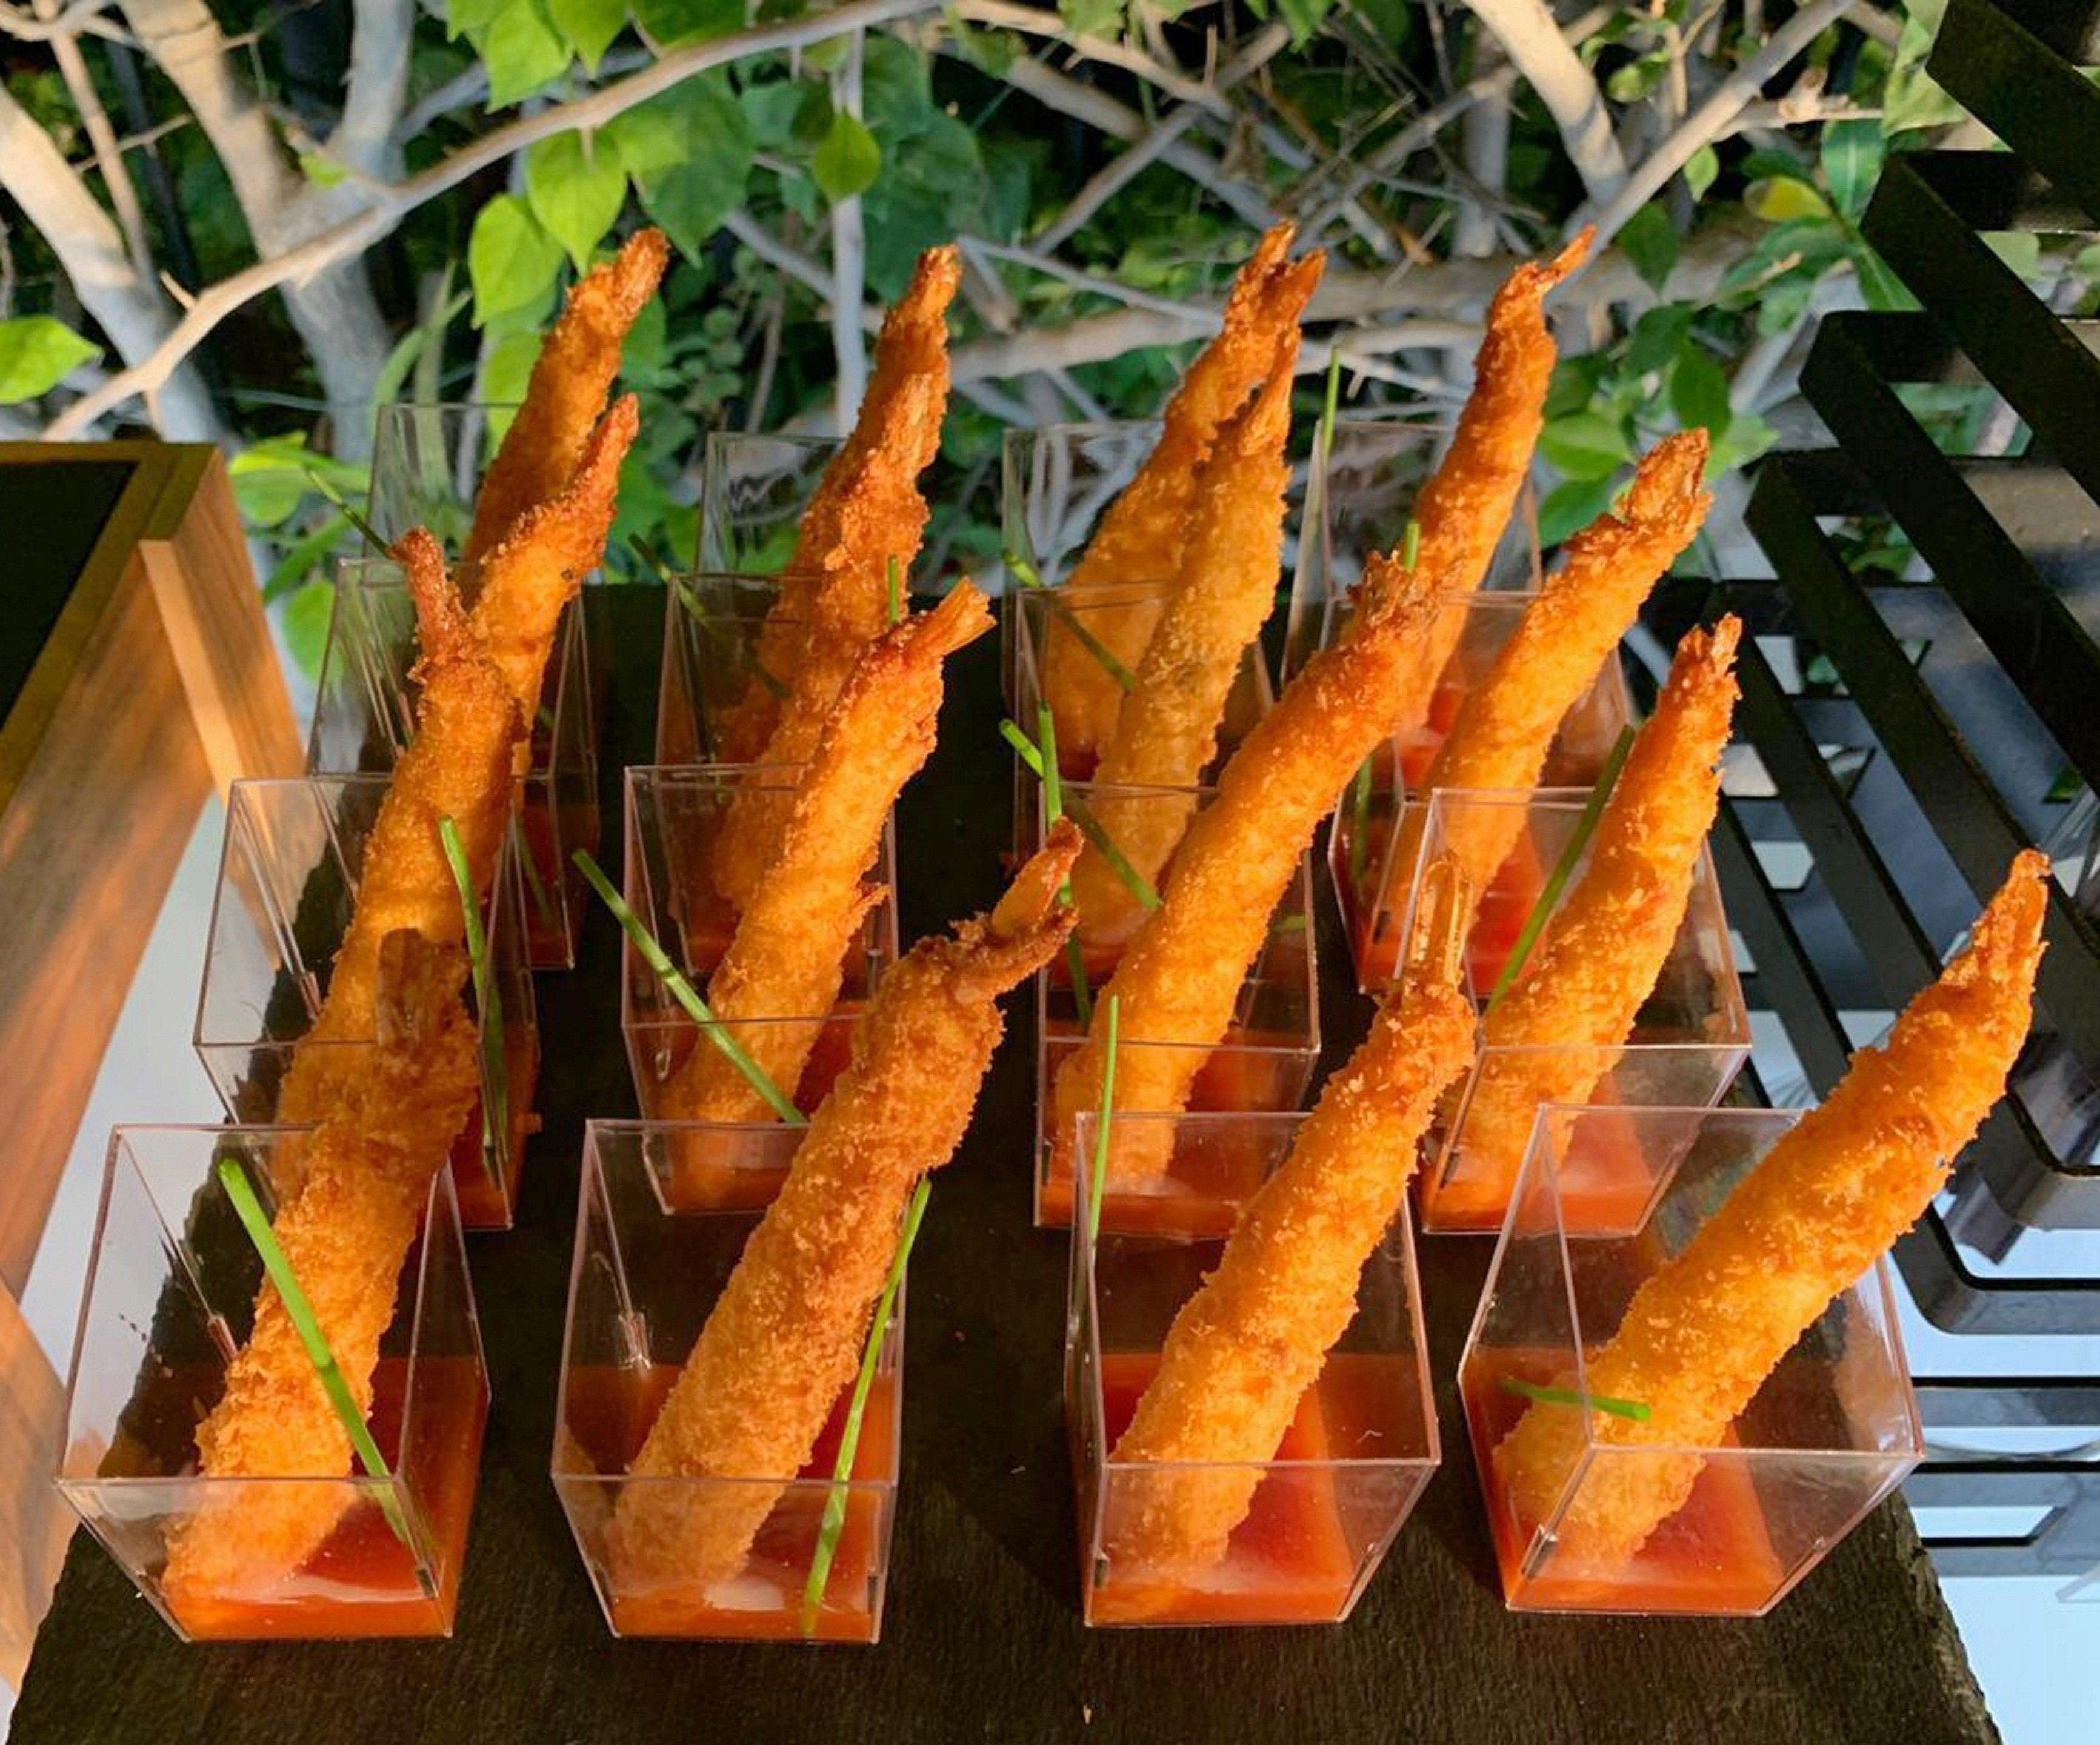 Crispy Prawns with Chili Dip